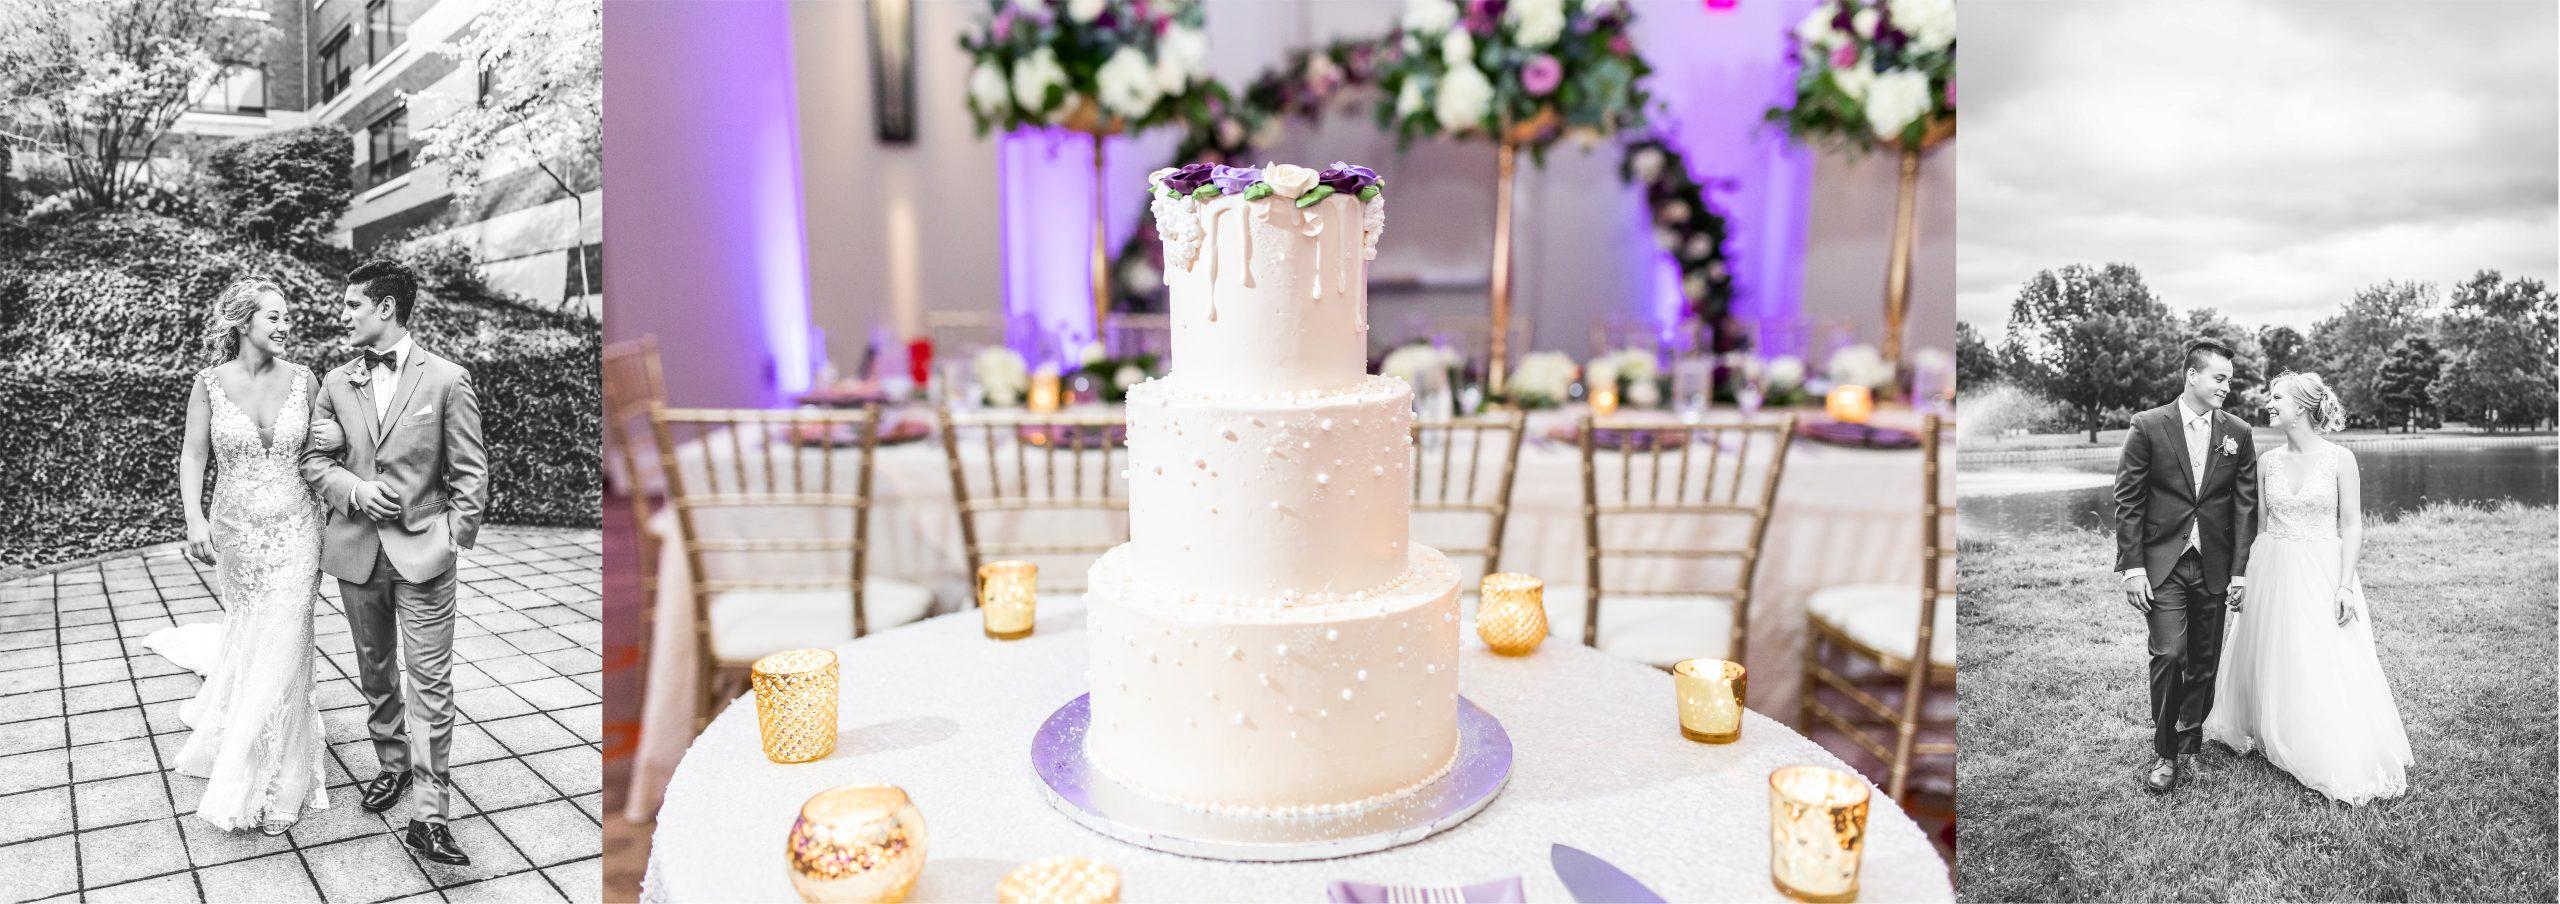 kandra-lynn-photography-michigan-wedding-photographer-02